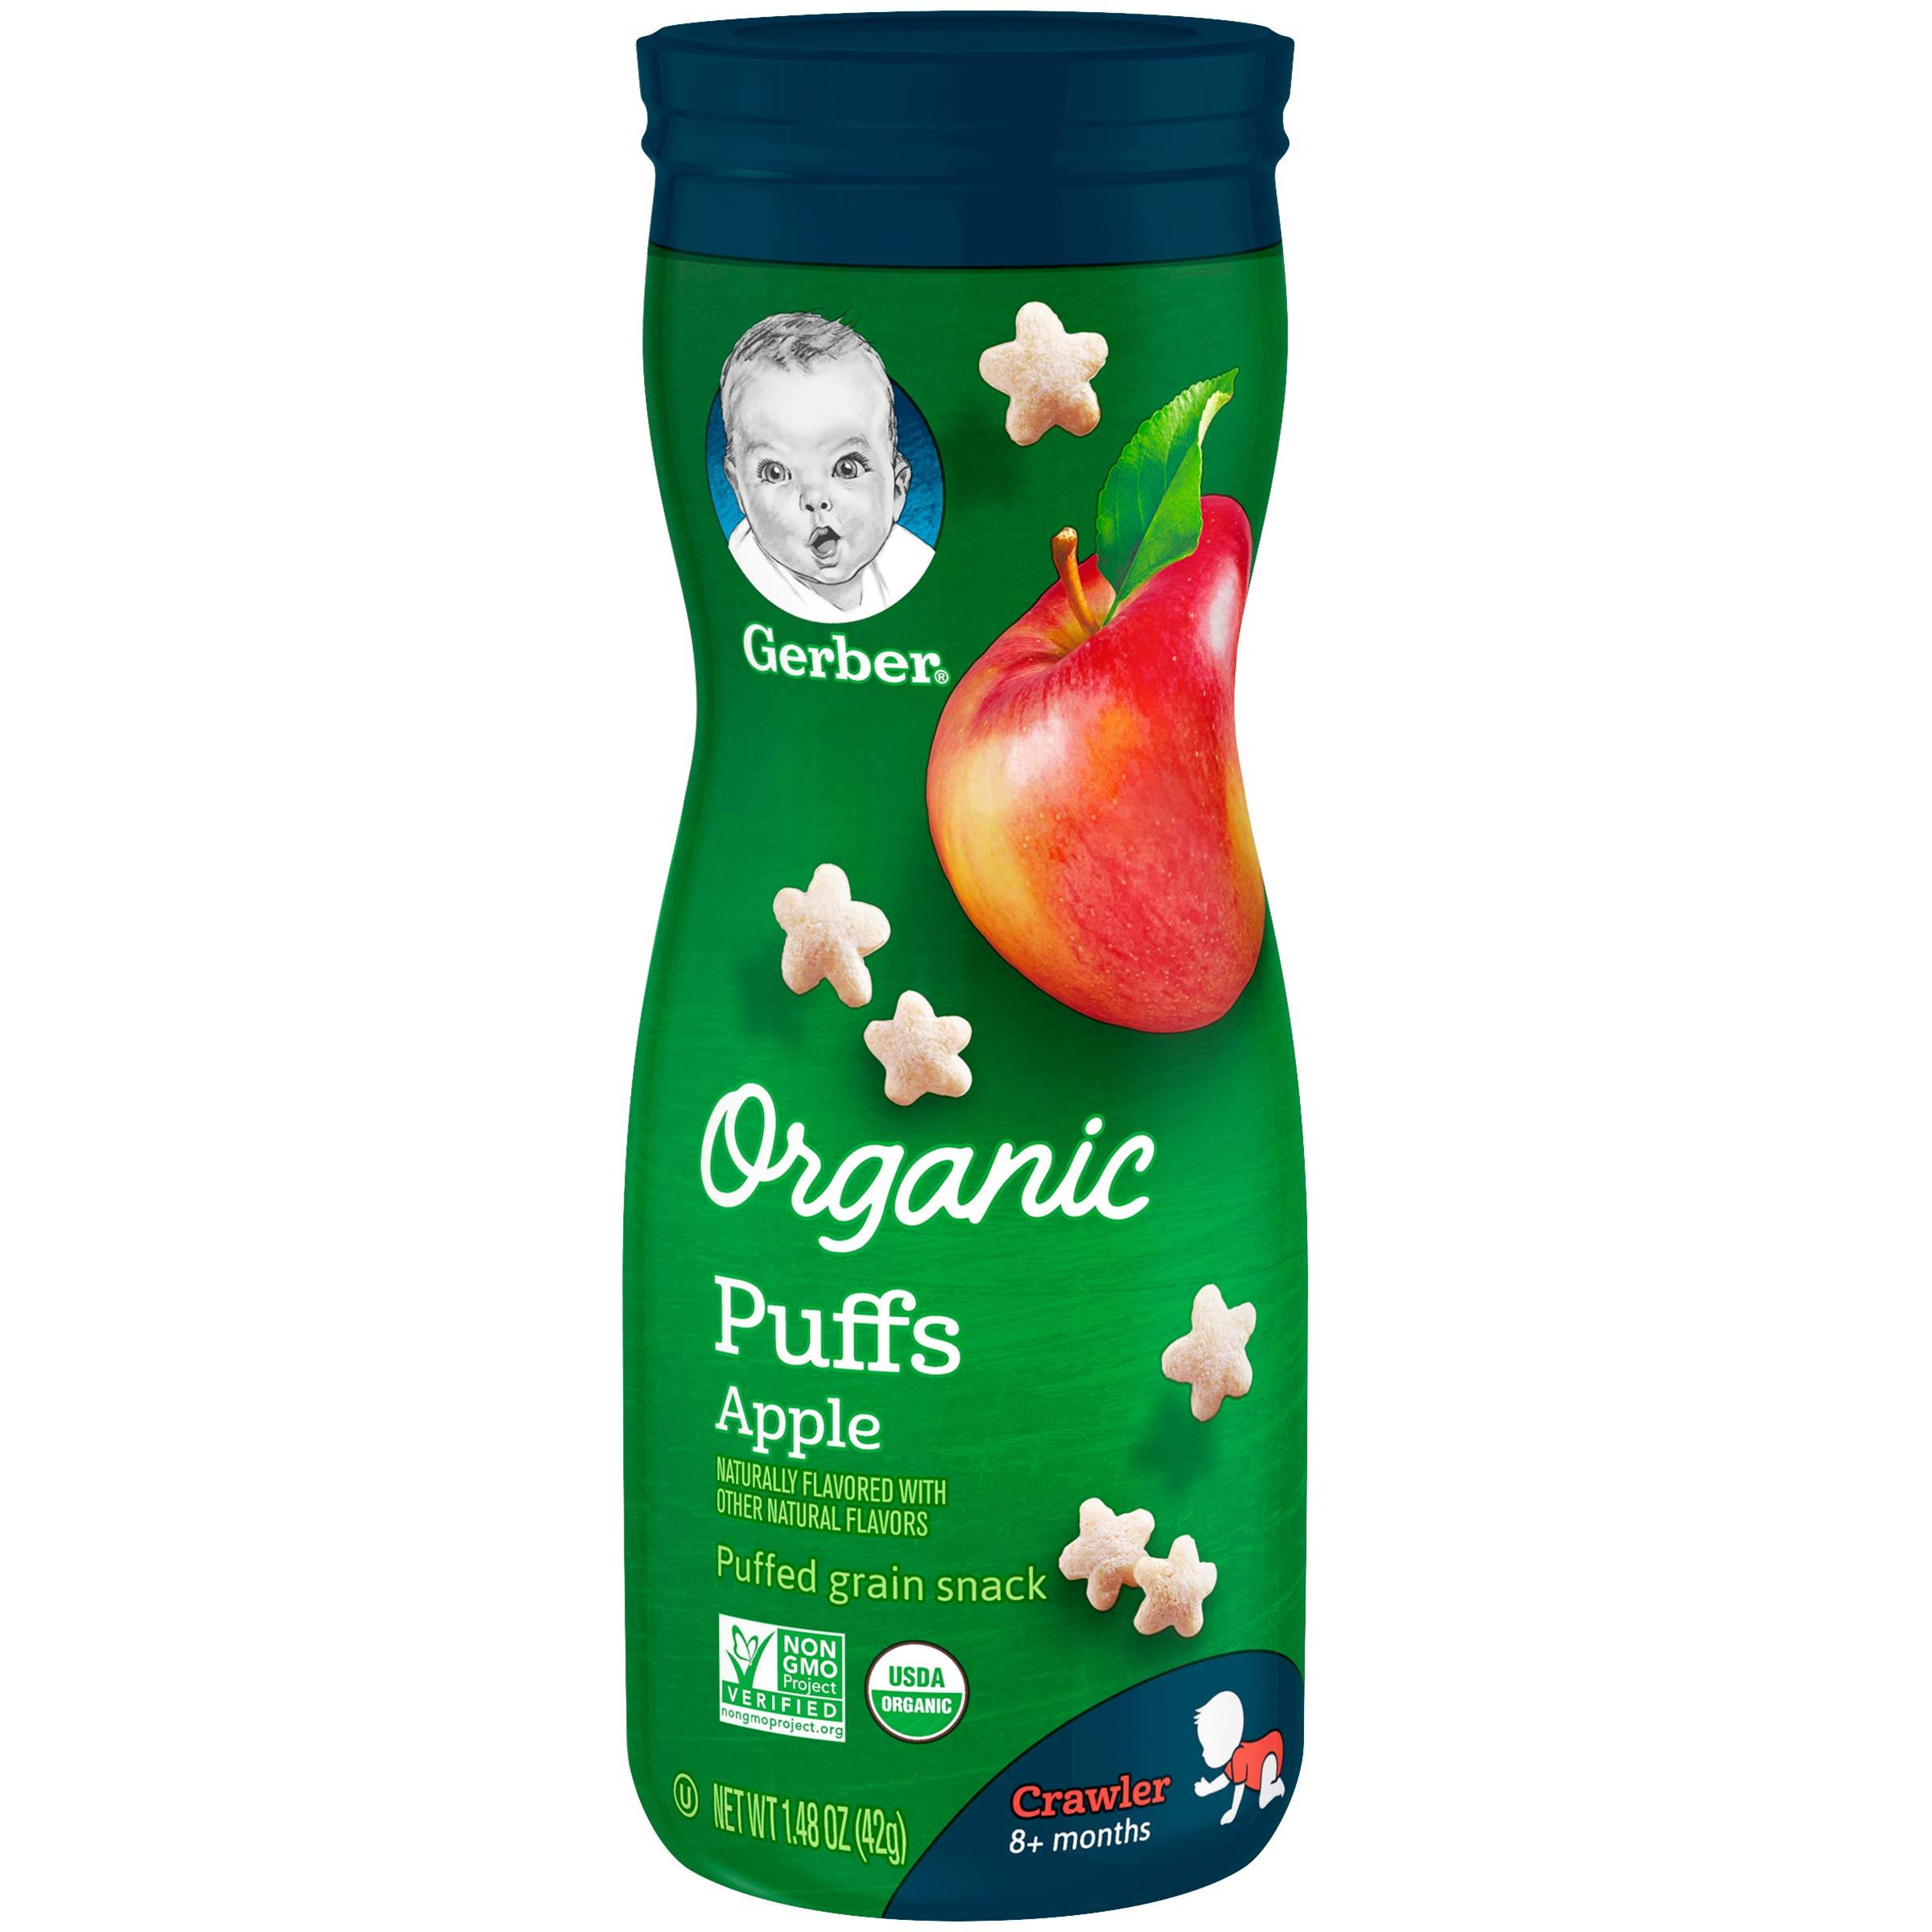 Gerber Organic Puffs Snack, Apple, 6 Count